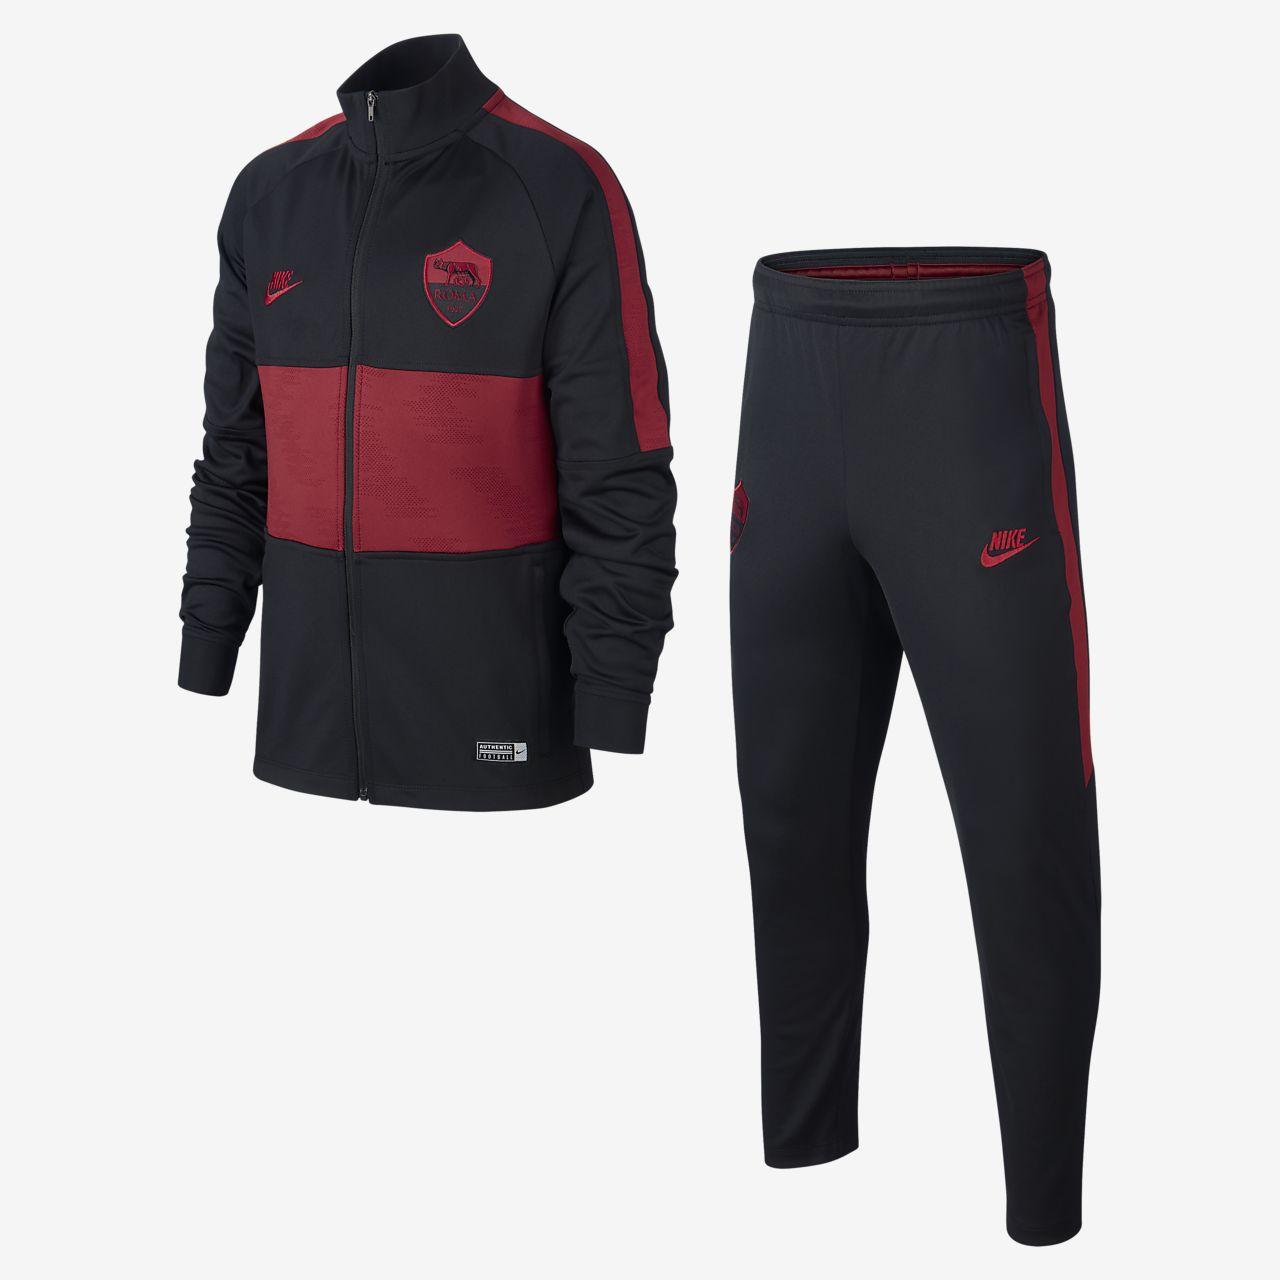 A.S. Rom Strike Fußball-Trainingsanzug für ältere Kinder